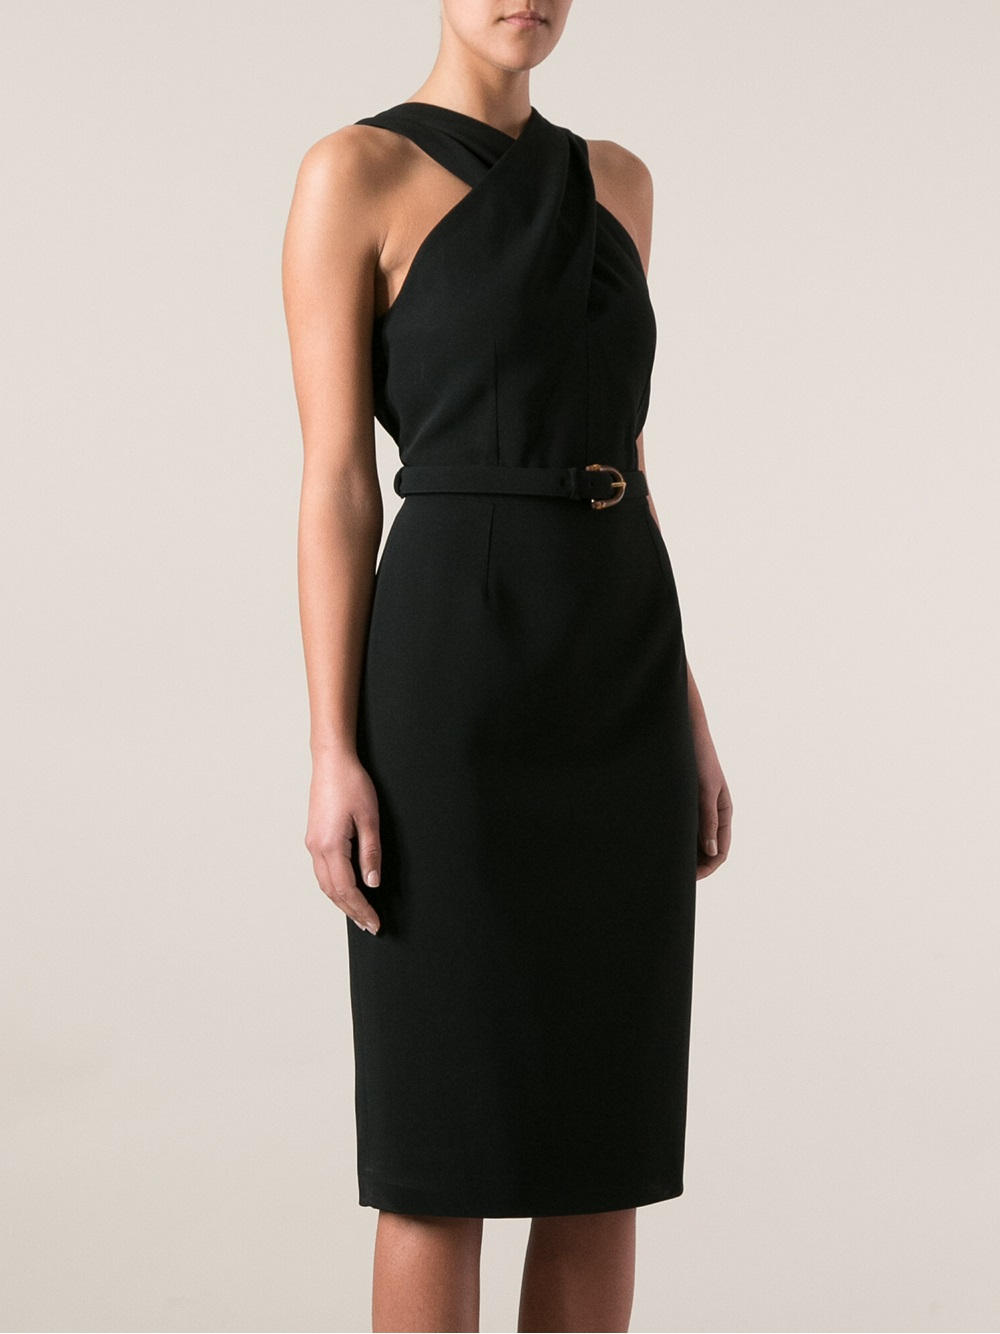 4b692c58d Gucci Belted Waist Dress in Black - Lyst